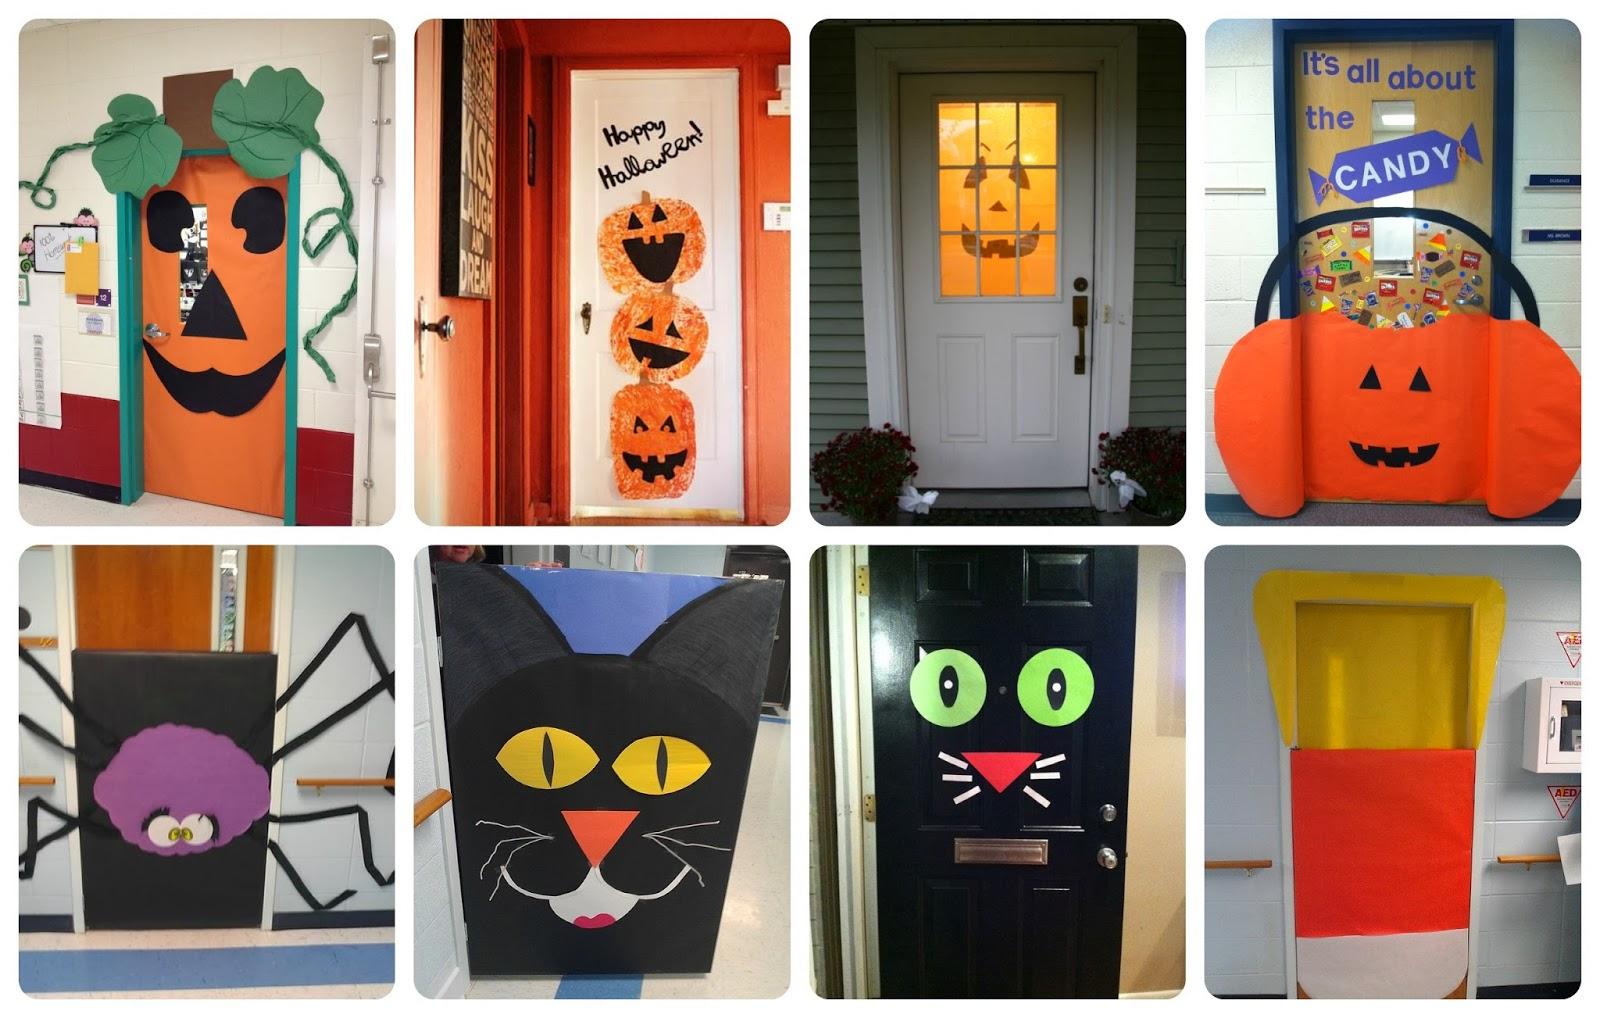 Halloween puertas 19 imagenes educativas for Puertas de halloween decoradas